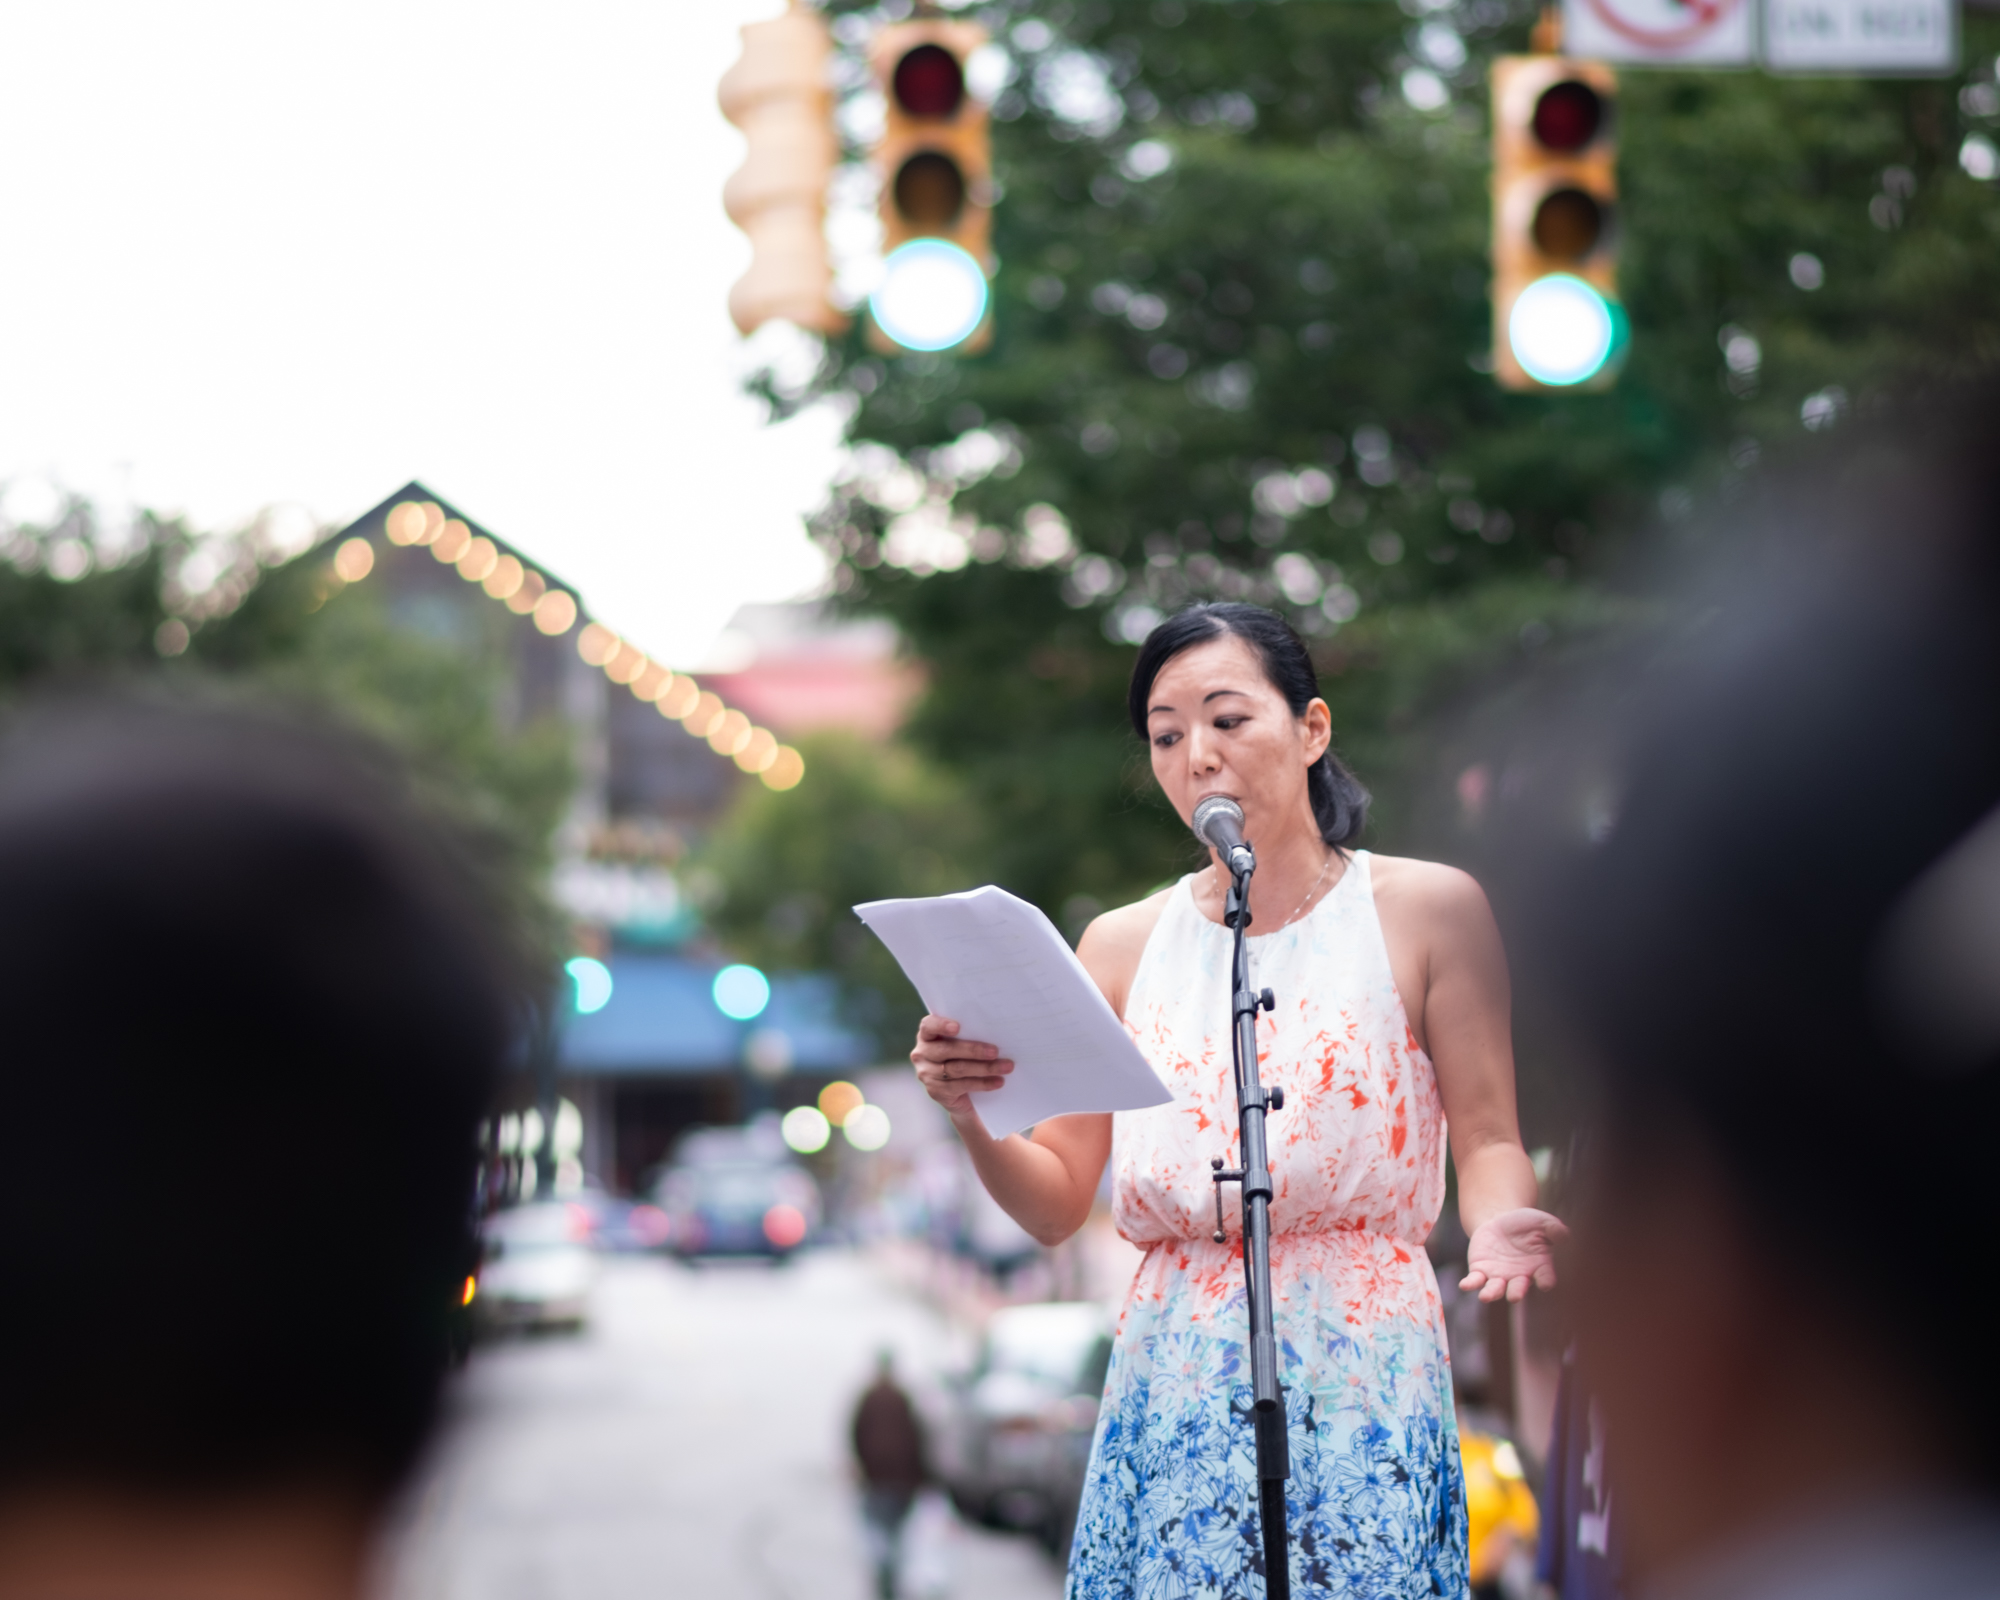 Momo Nakamura performing in   Reflections on Identity   at the Charm City Night Market. Photo courtesy of Corey Jennings.